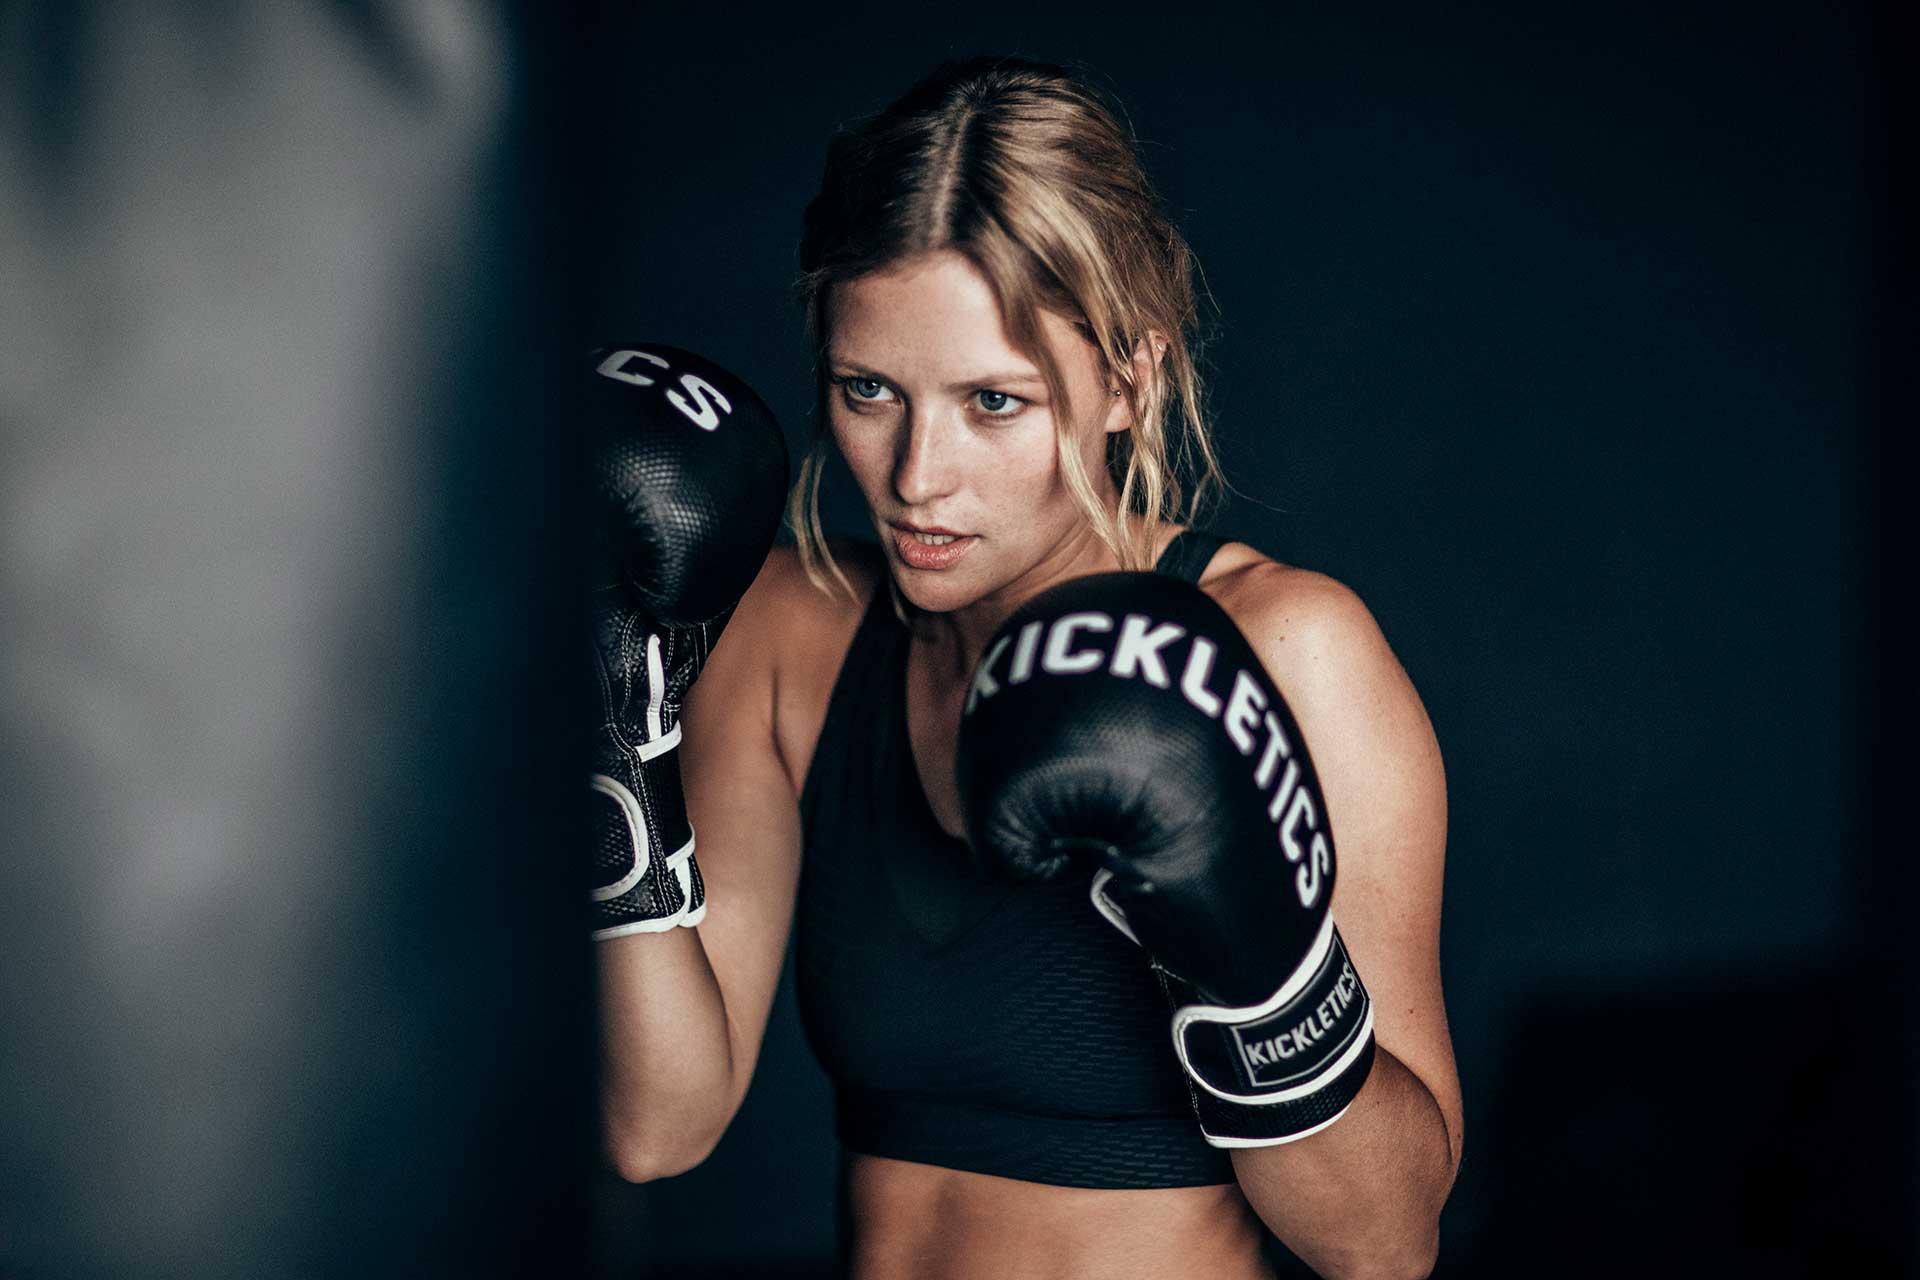 Sportmodel Boxen Frau Fitness Training Fokus Odlo Fotograf Michael Müller